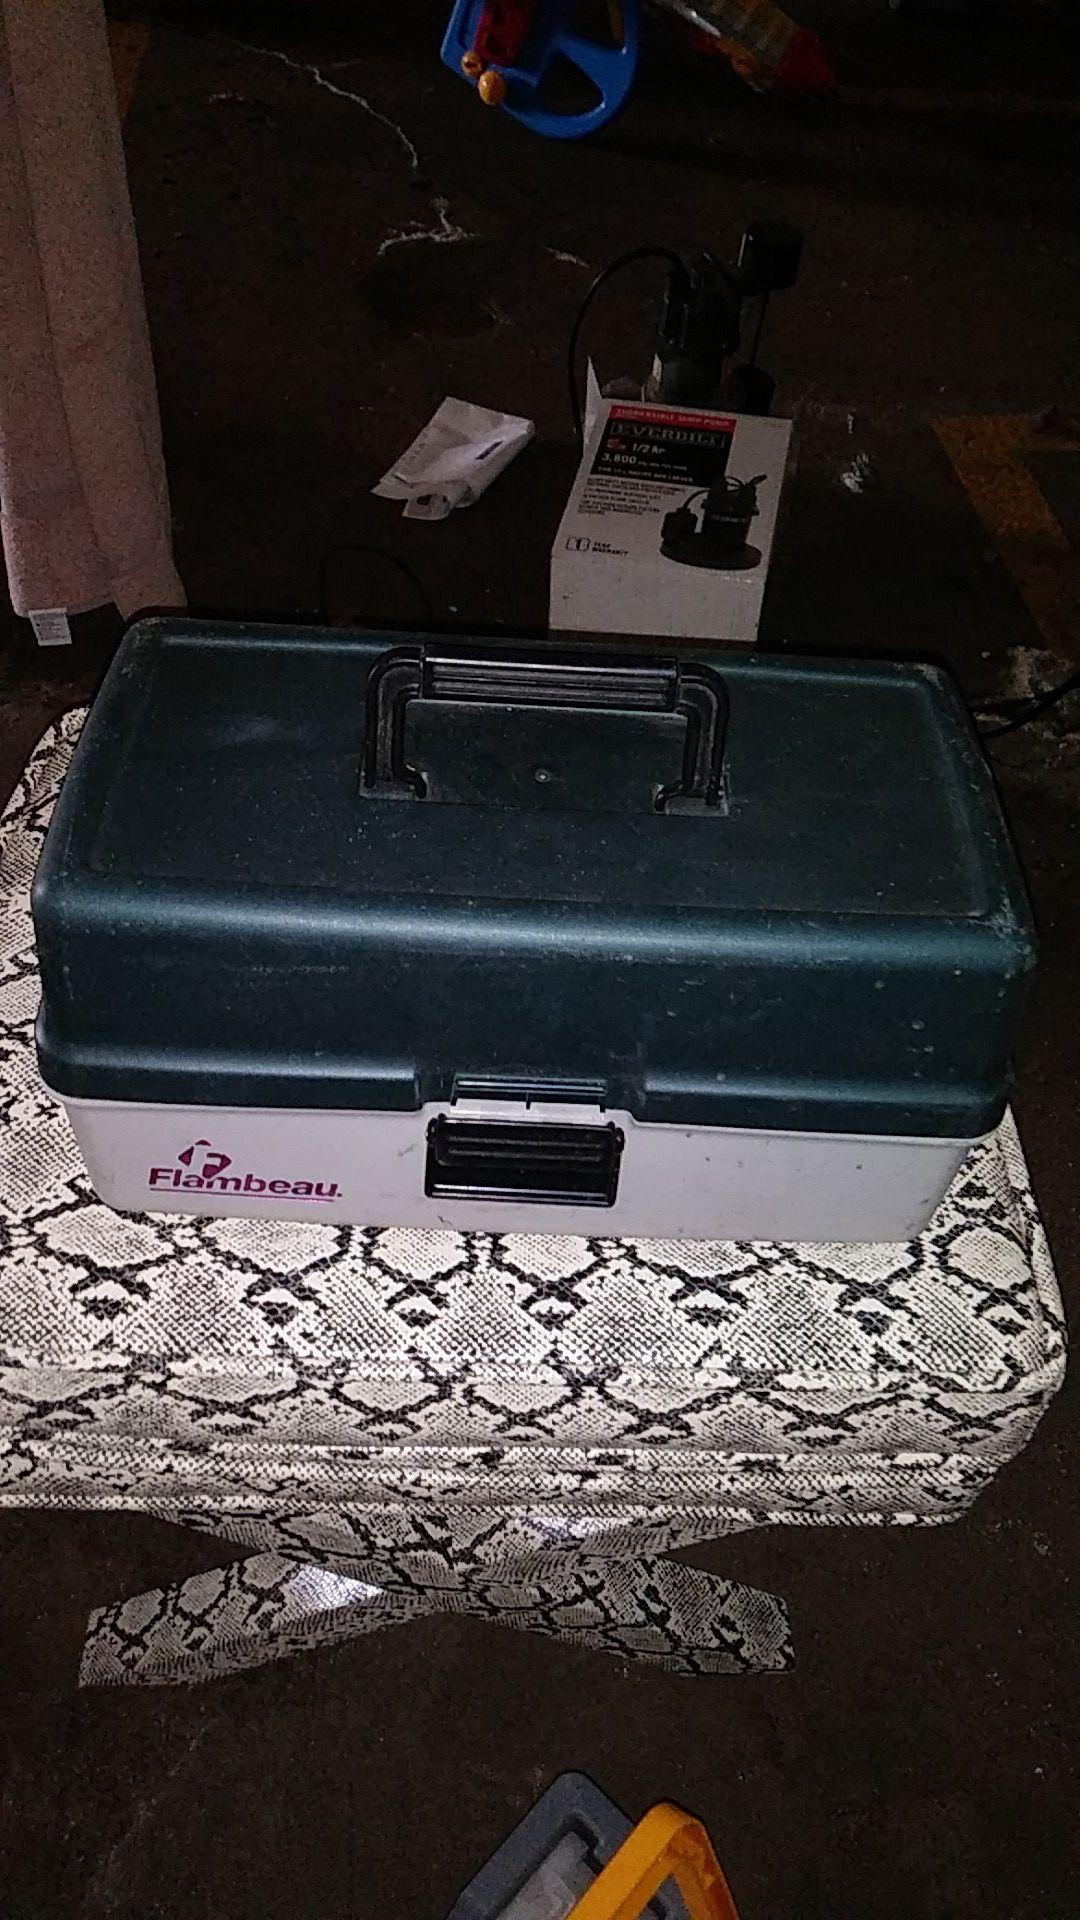 Flambeau box